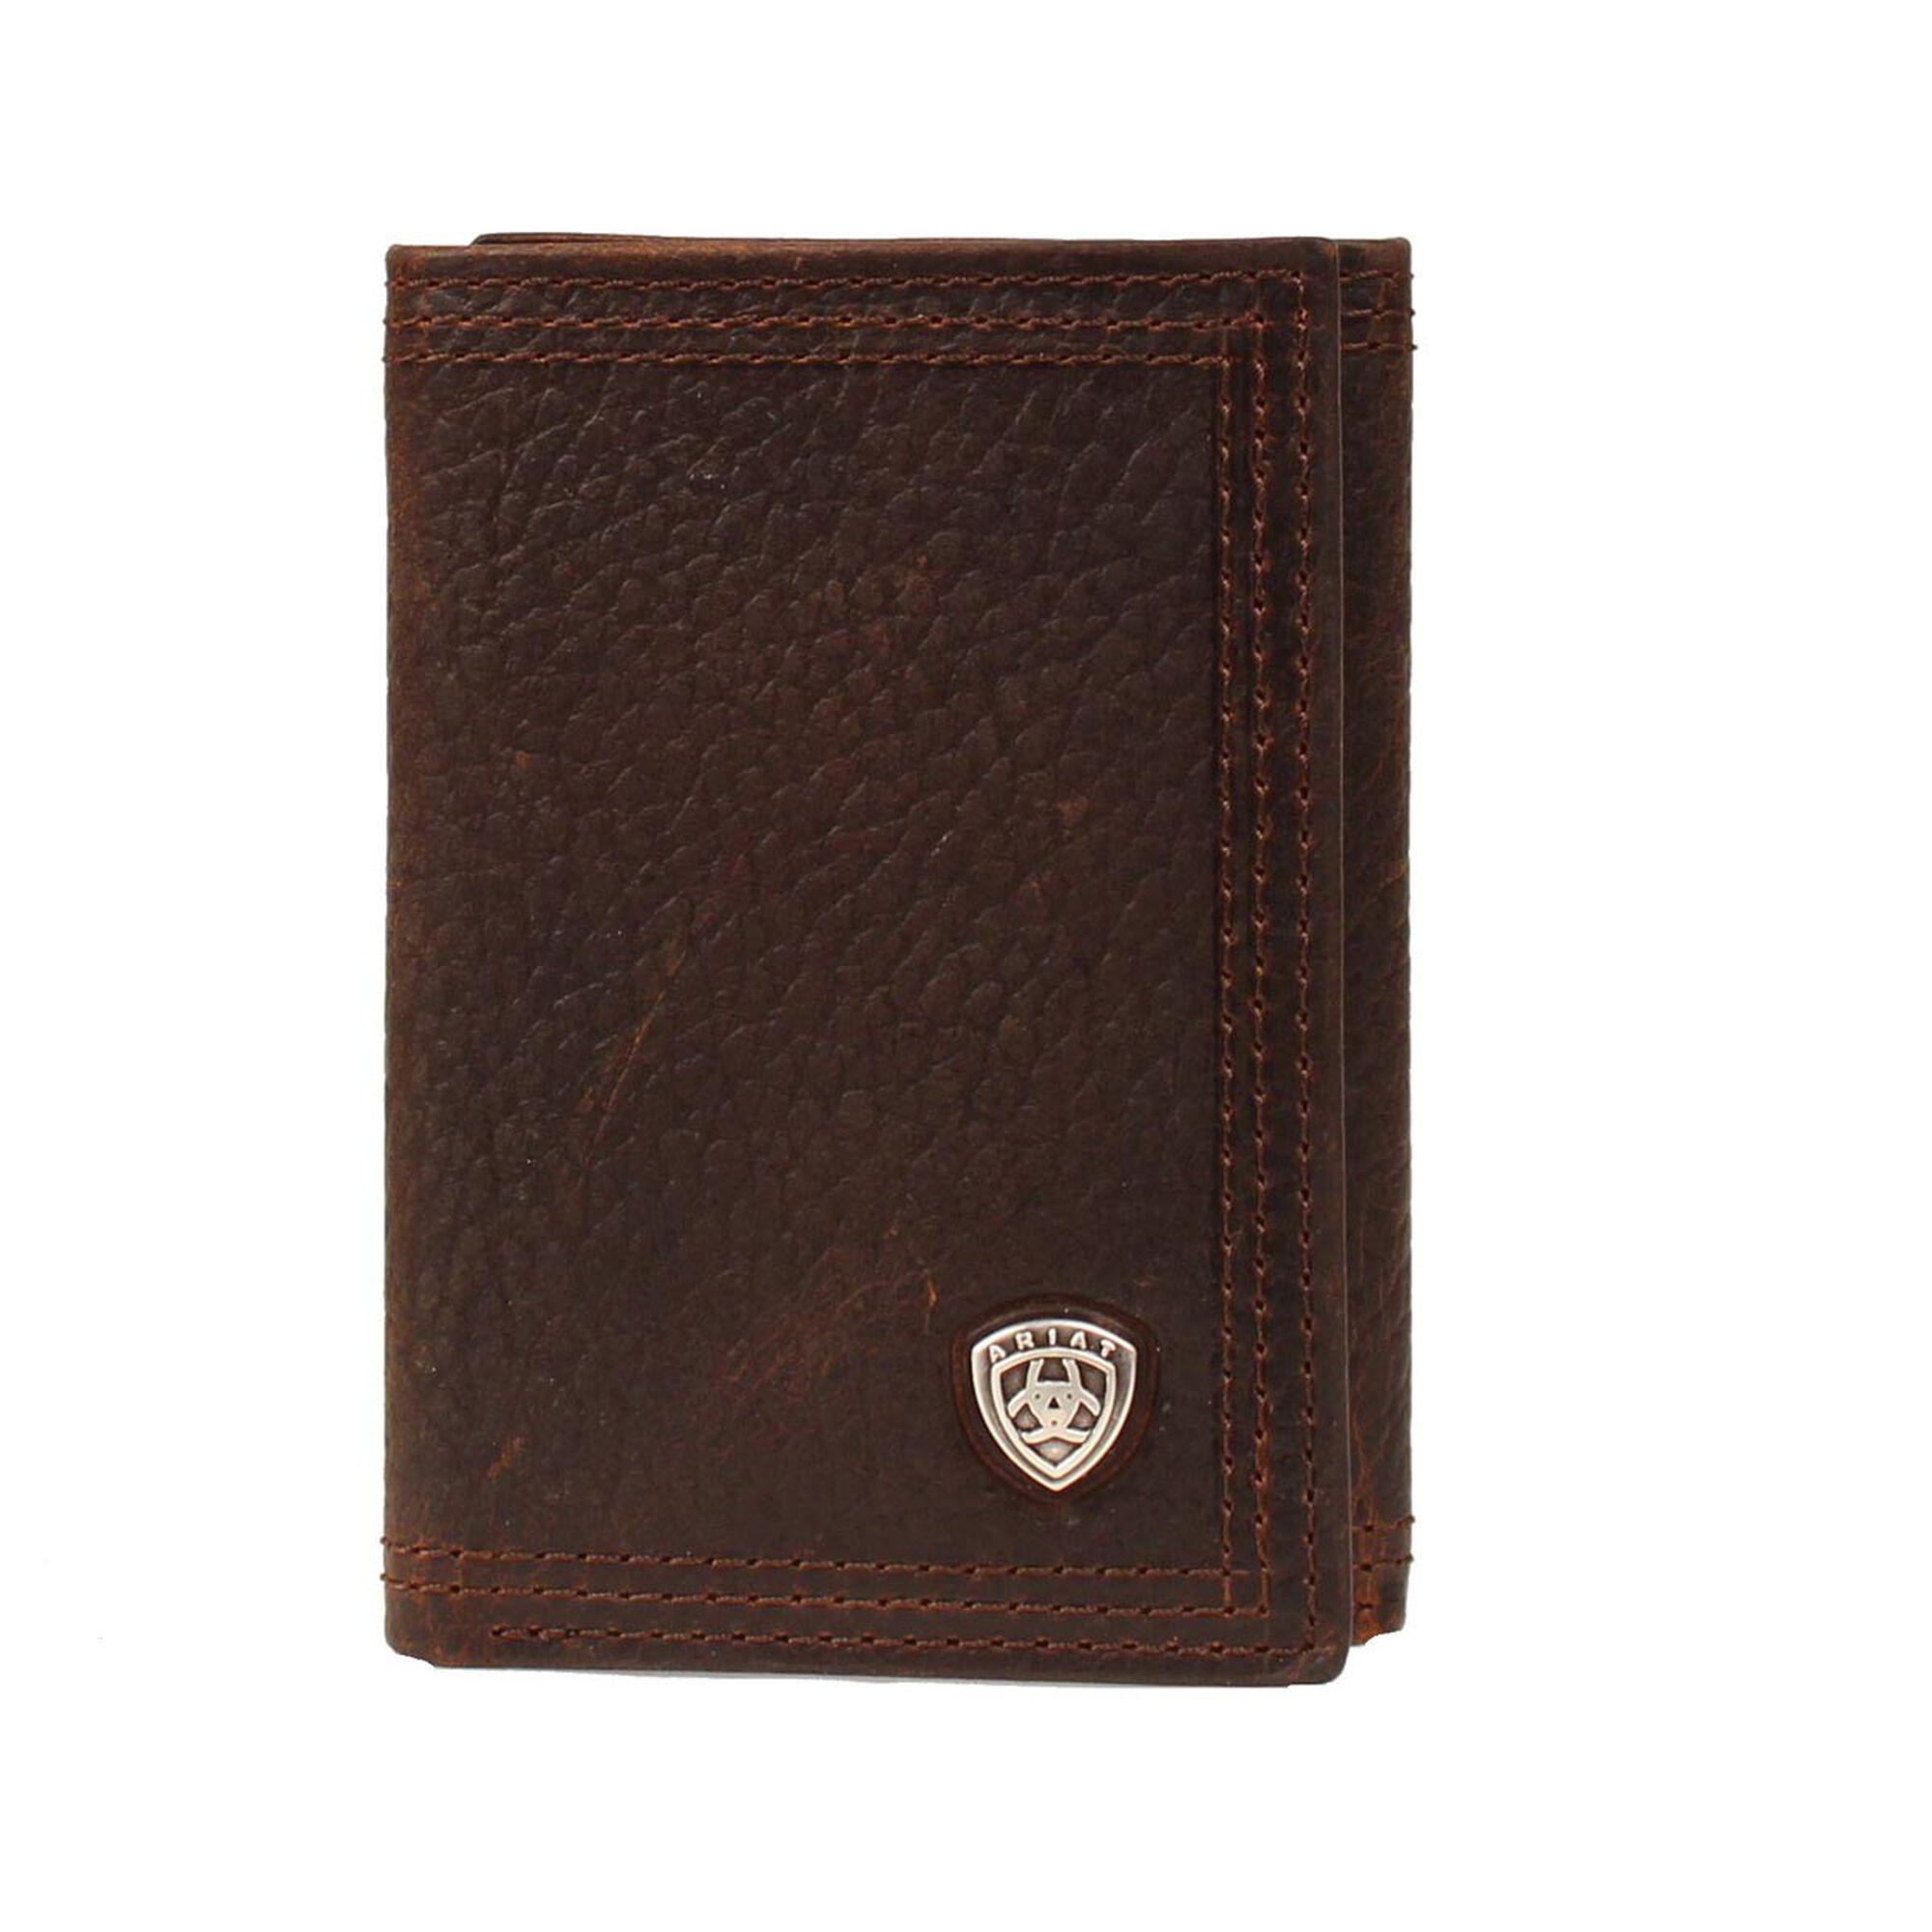 Triple Stitch Trifold Wallet